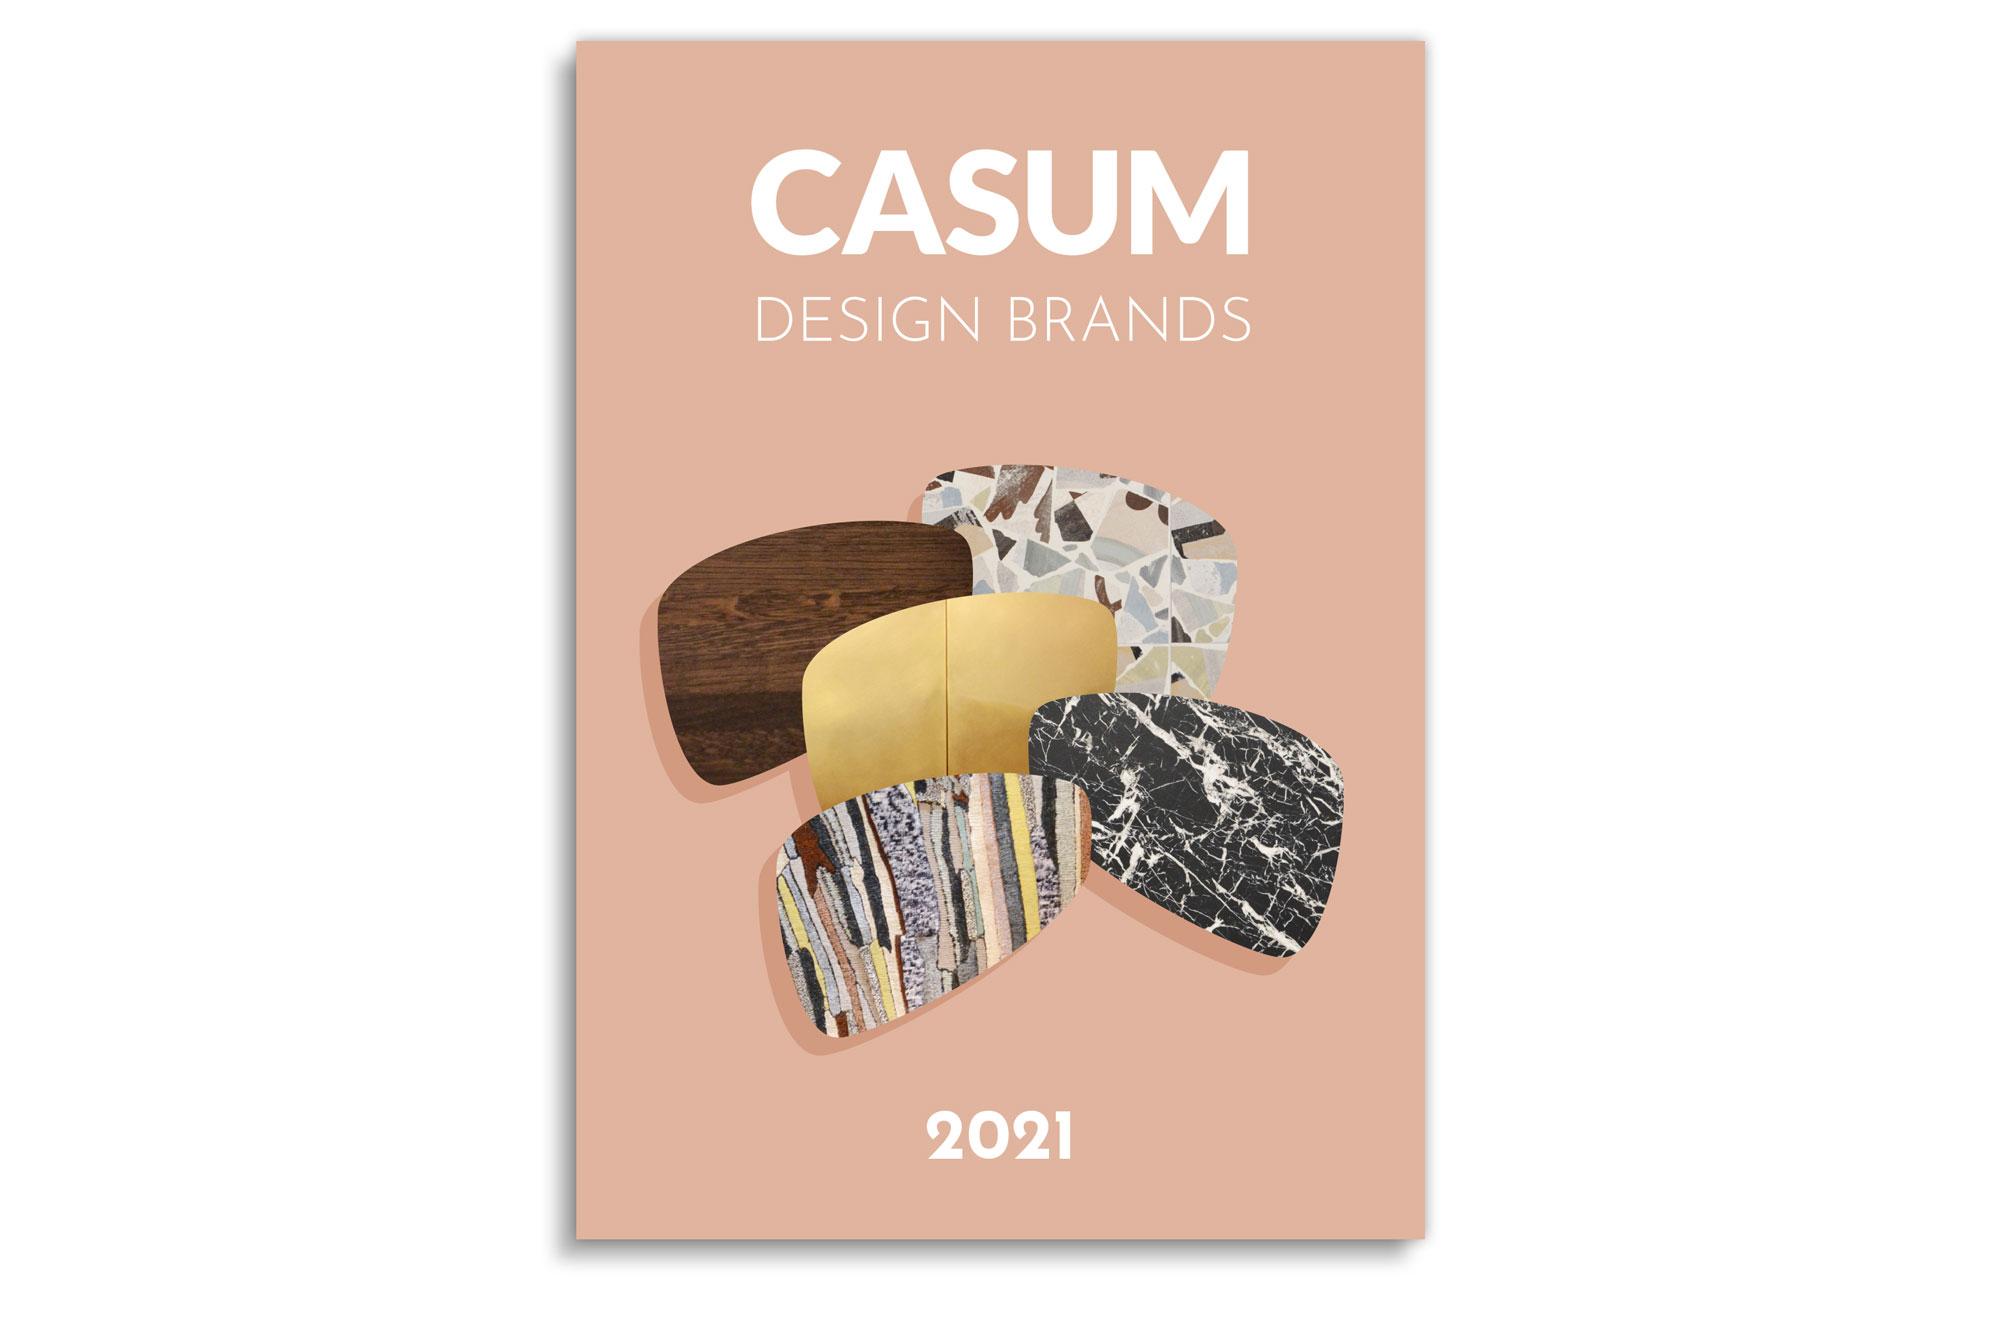 Casum Design Brands 2021 cover